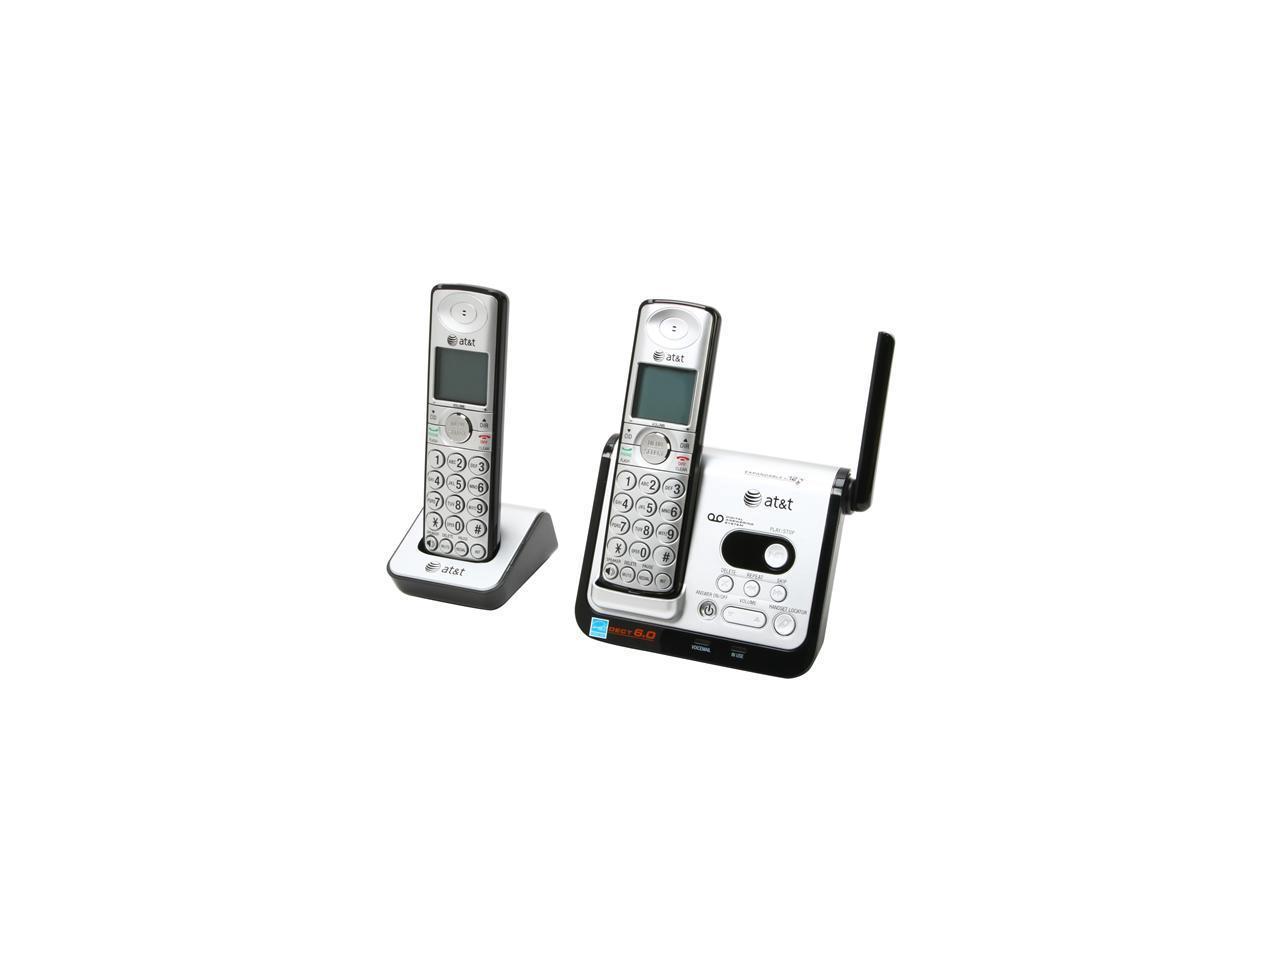 AT&T CL82209 1.9 GHz Digital DECT 6.0 2X Handsets Cordless